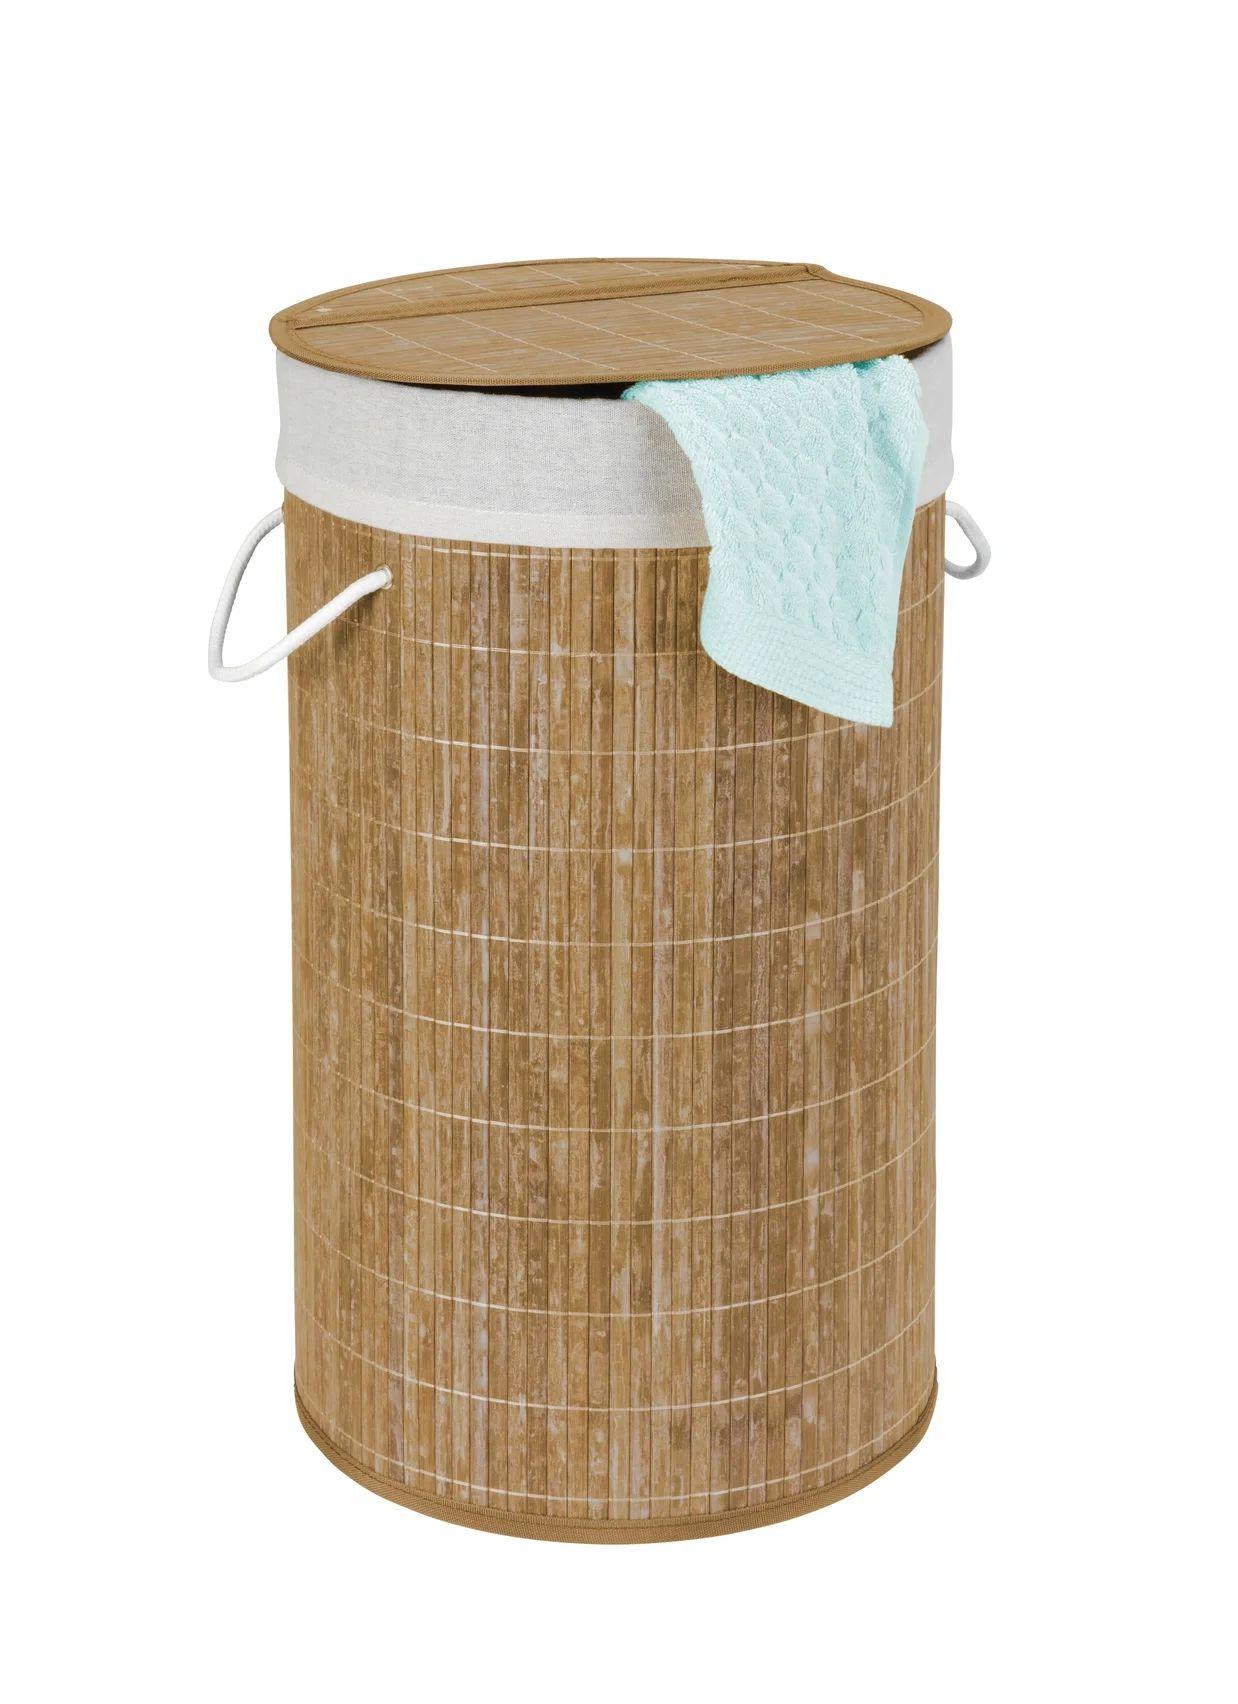 Panier A Linge Bambou Bamboo L 35 X H 60 X P 35 Cm Wenko Leroy Merlin